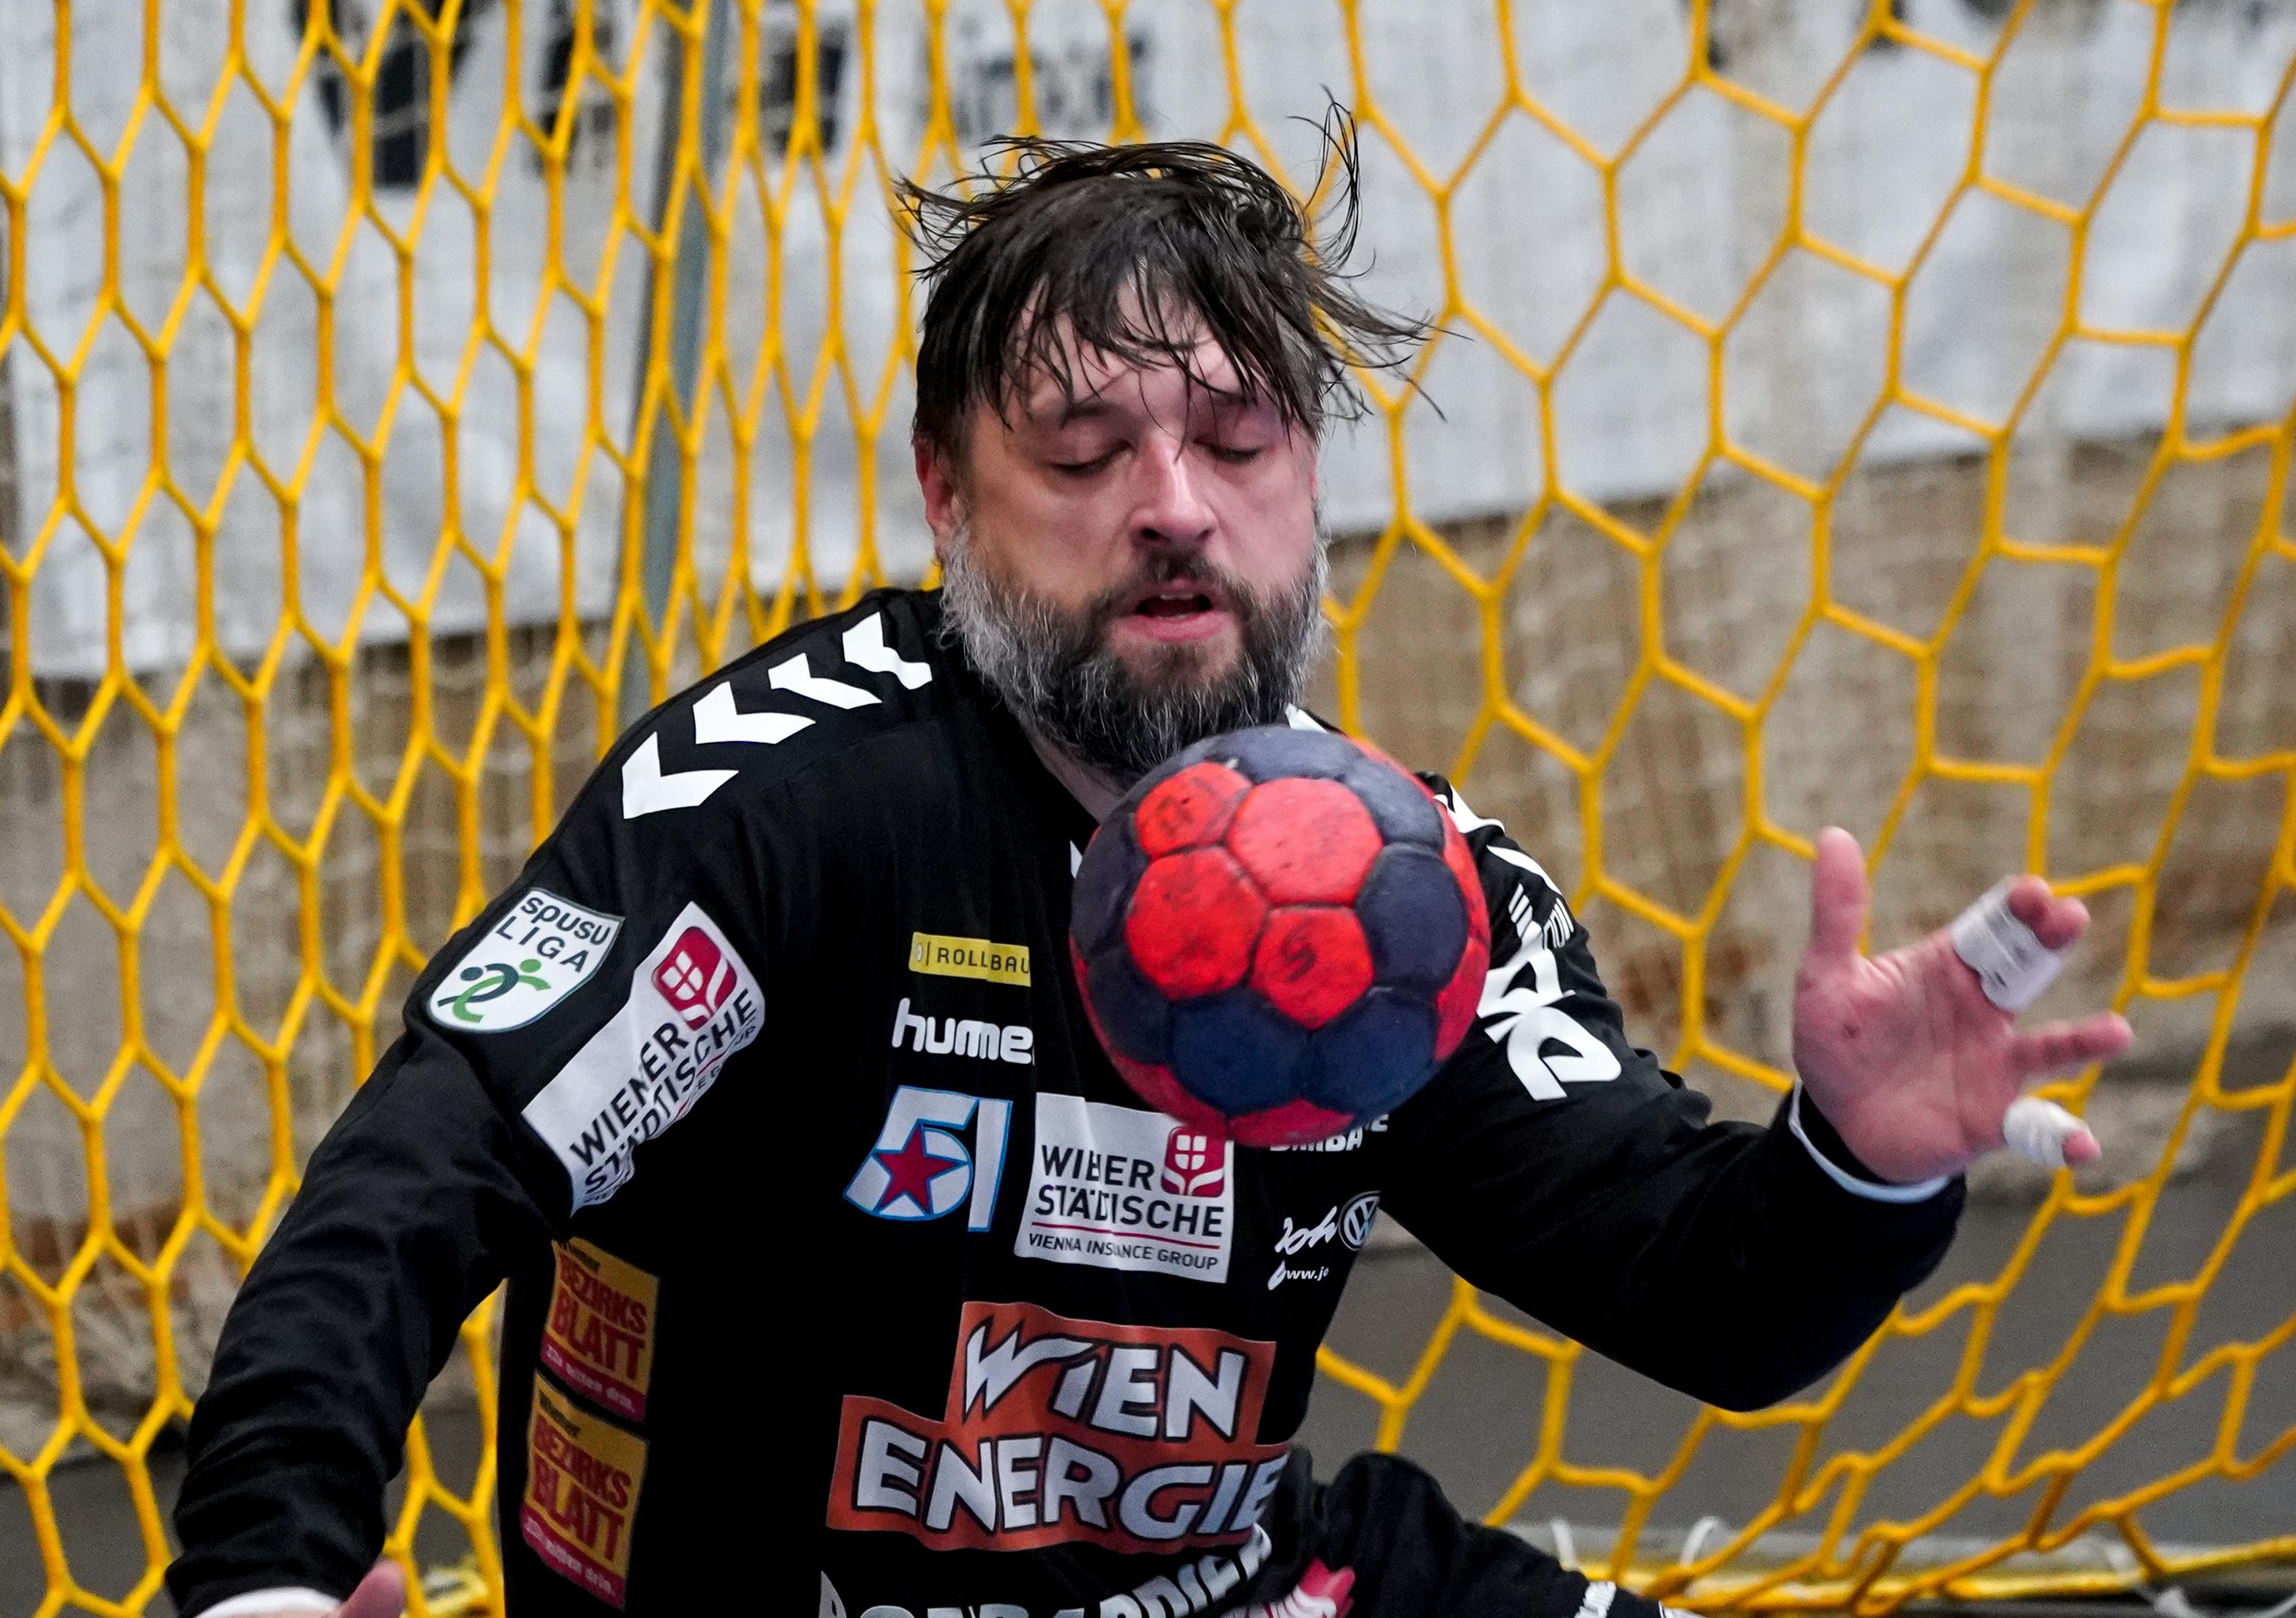 15.12.2019 Handball, HLA, Wien, Hollgasse, Fivers - Ferlach, Wolfgang Filzwieser , Copyright DIENER / Philipp Schalber